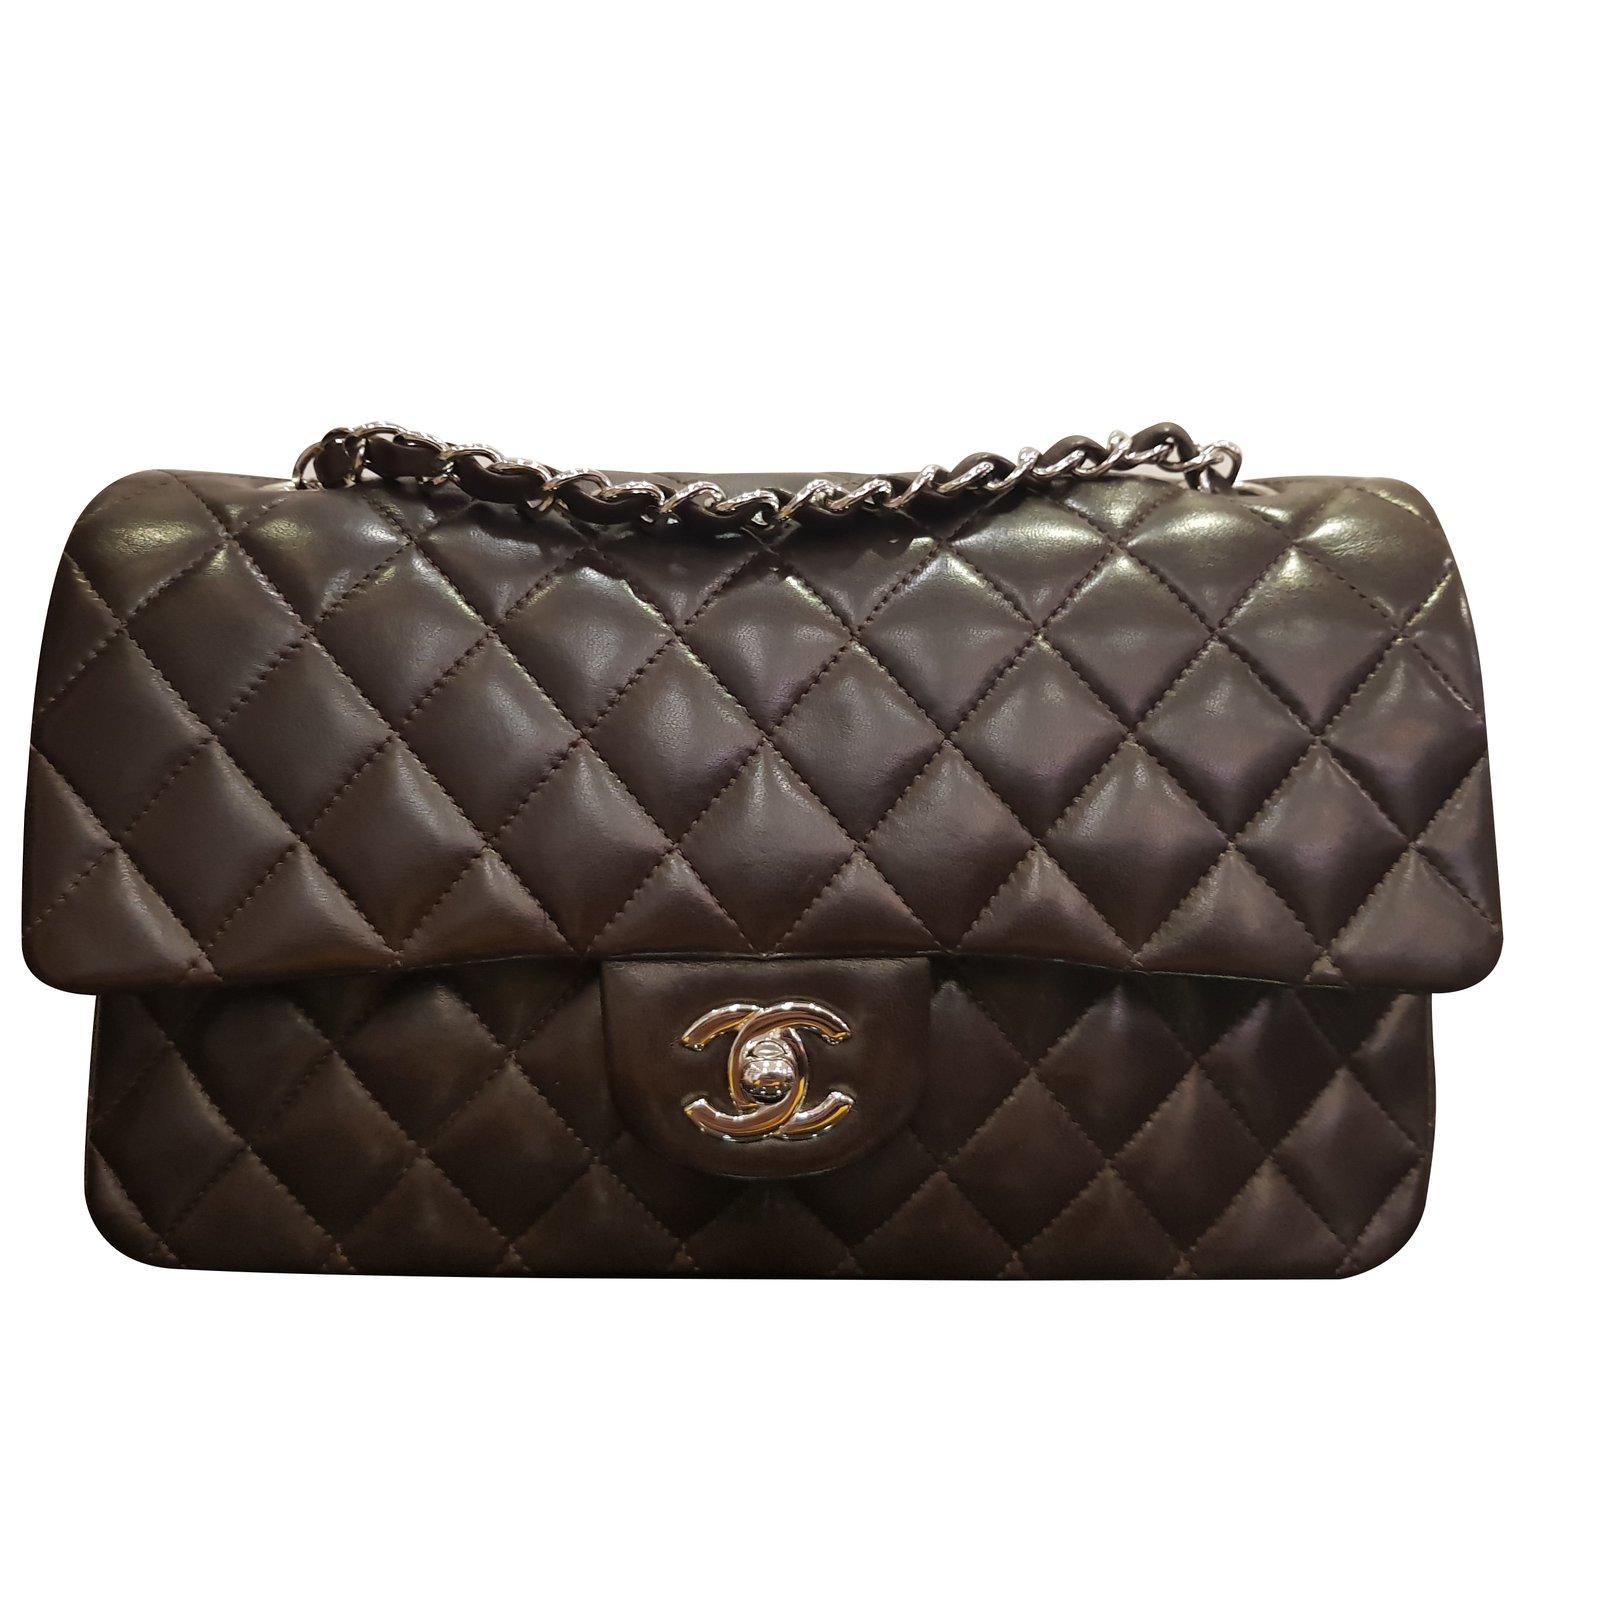 78441da0befa8 Sacs à main Chanel Sac Chanel timeless cuir lisse Cuir Marron foncé  ref.101854